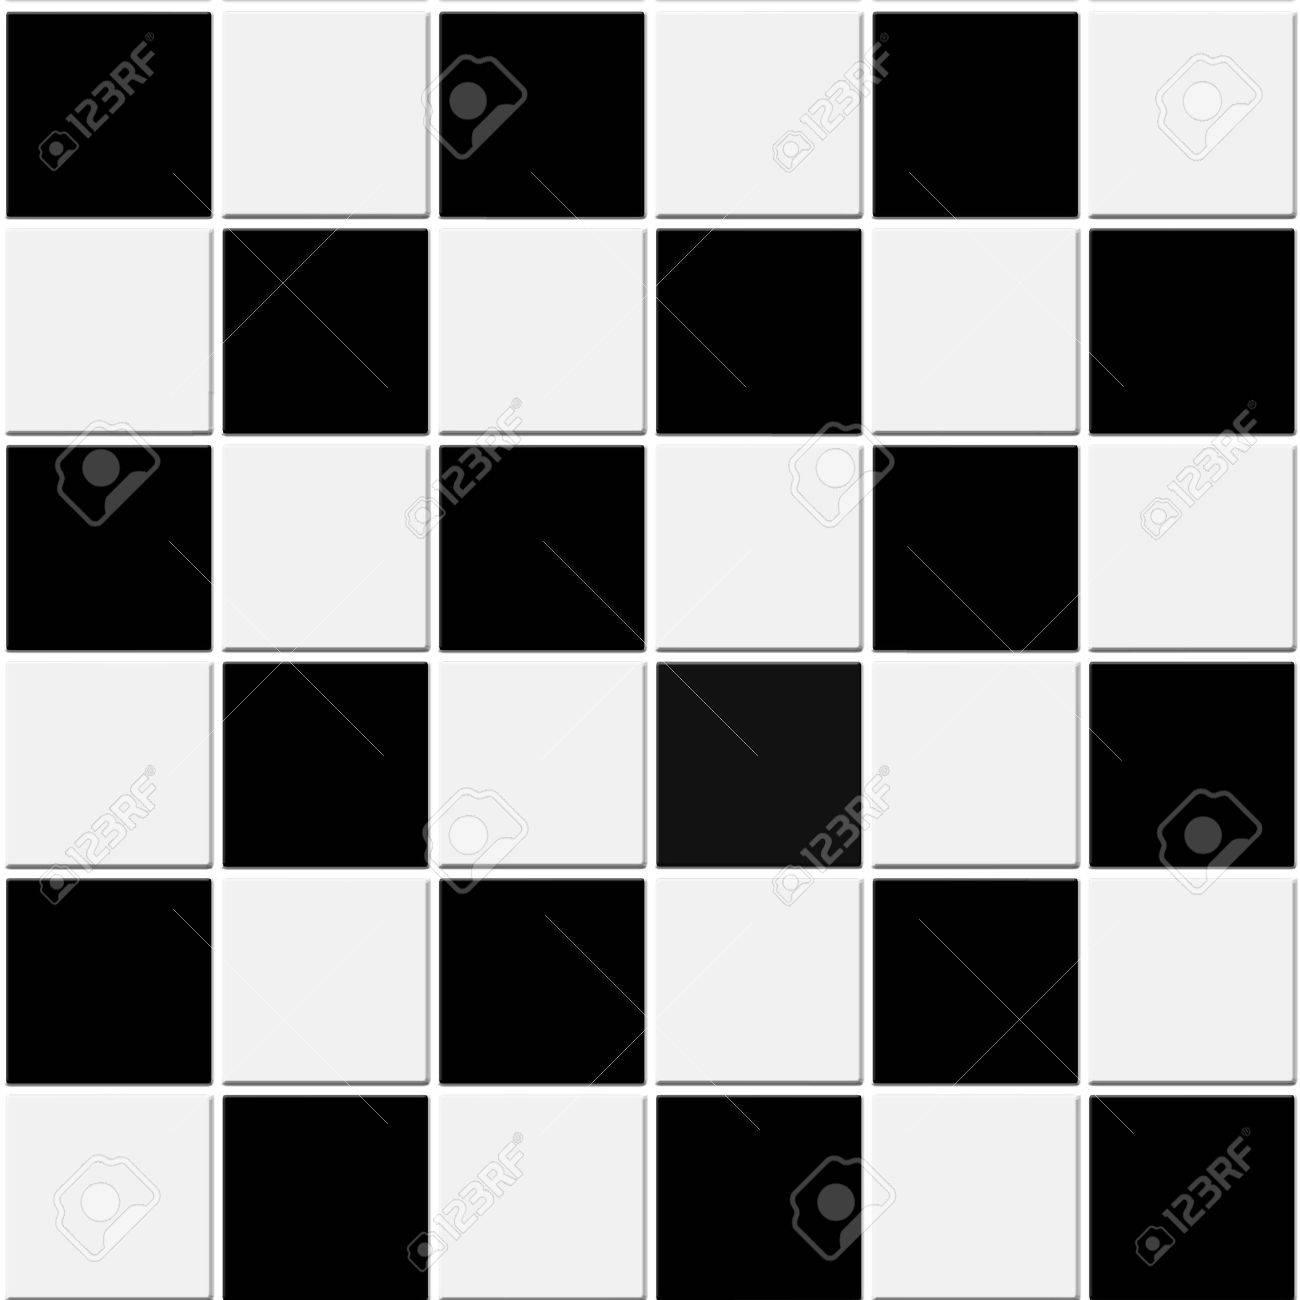 Piastrelle a scacchi